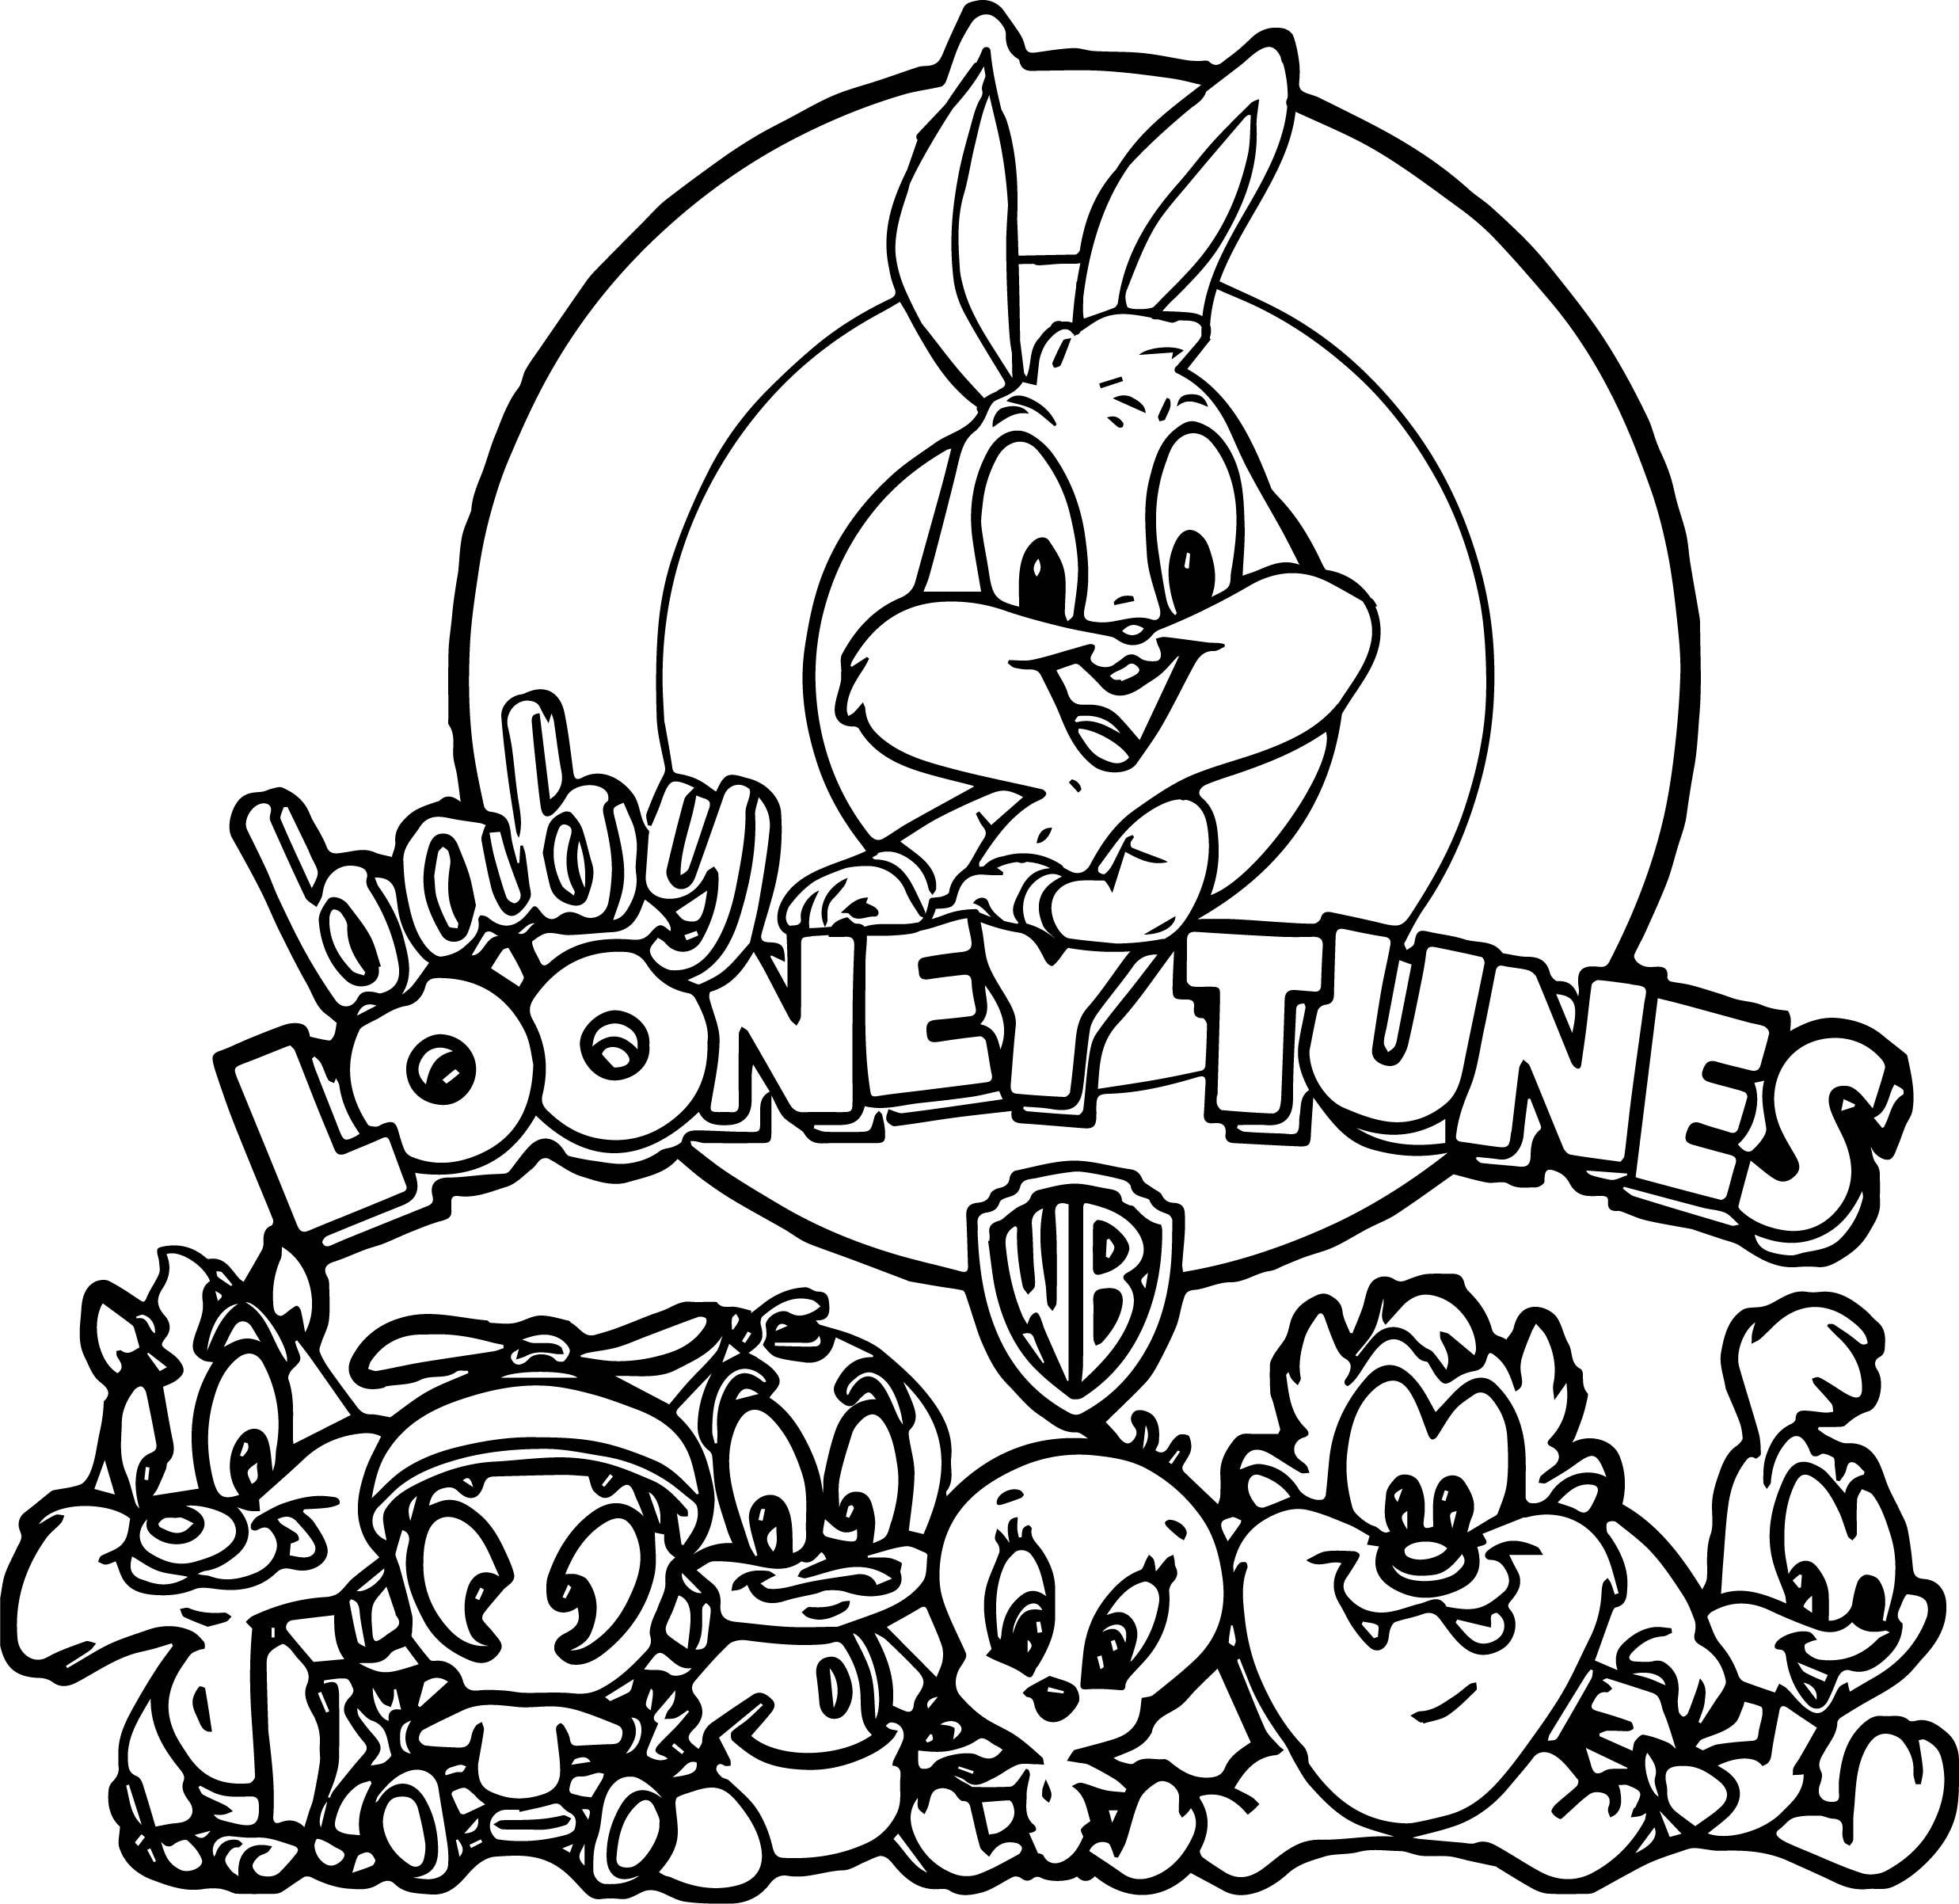 Warner Bros Baby Looney Tunes All Coloring Page